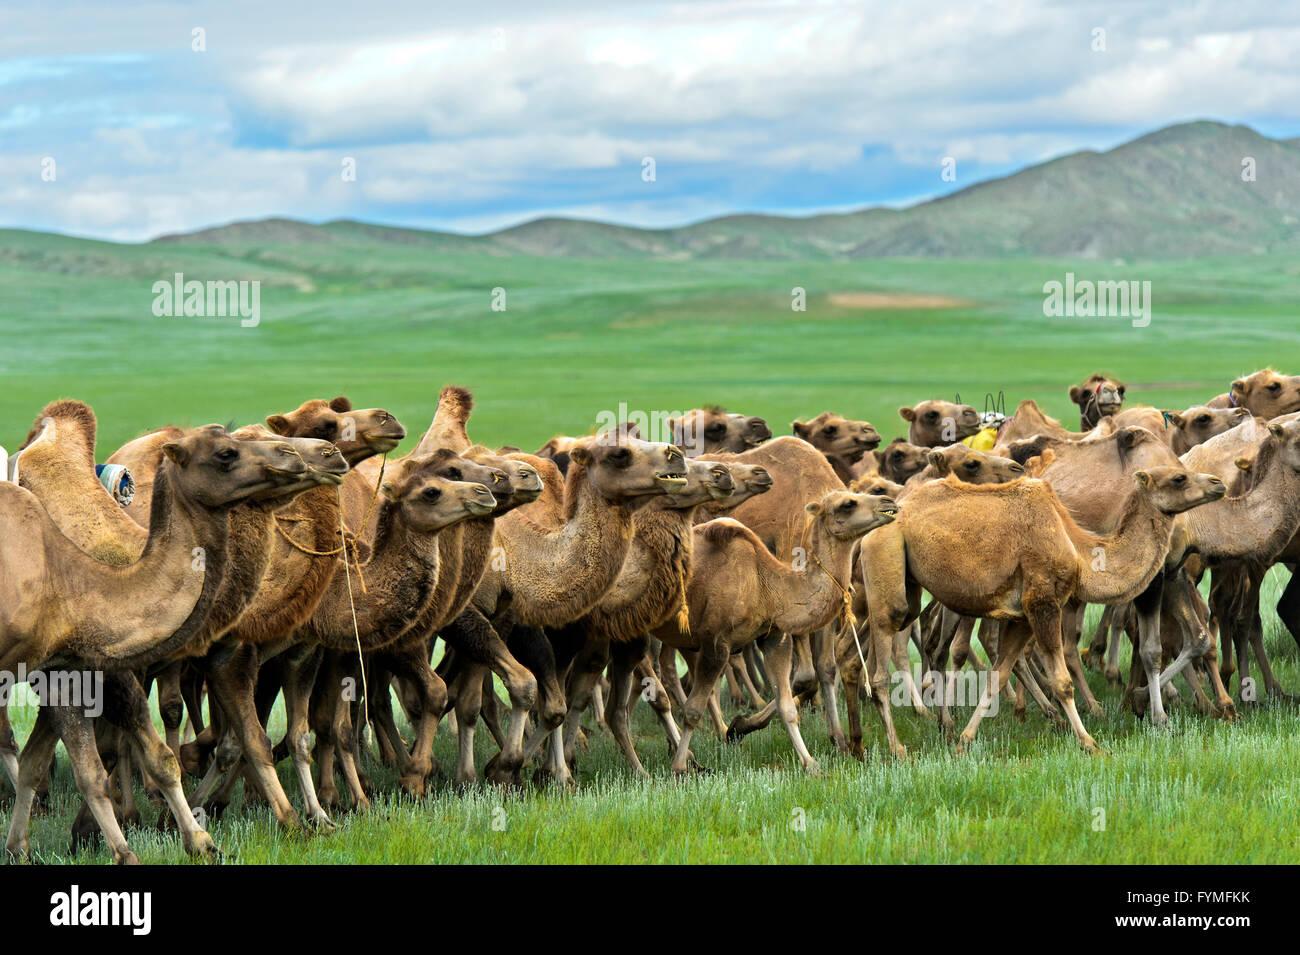 Allevamento di cammelli Bactrian (Camelus bactrianus) roaming nella steppa Mongola, Mongolia Immagini Stock